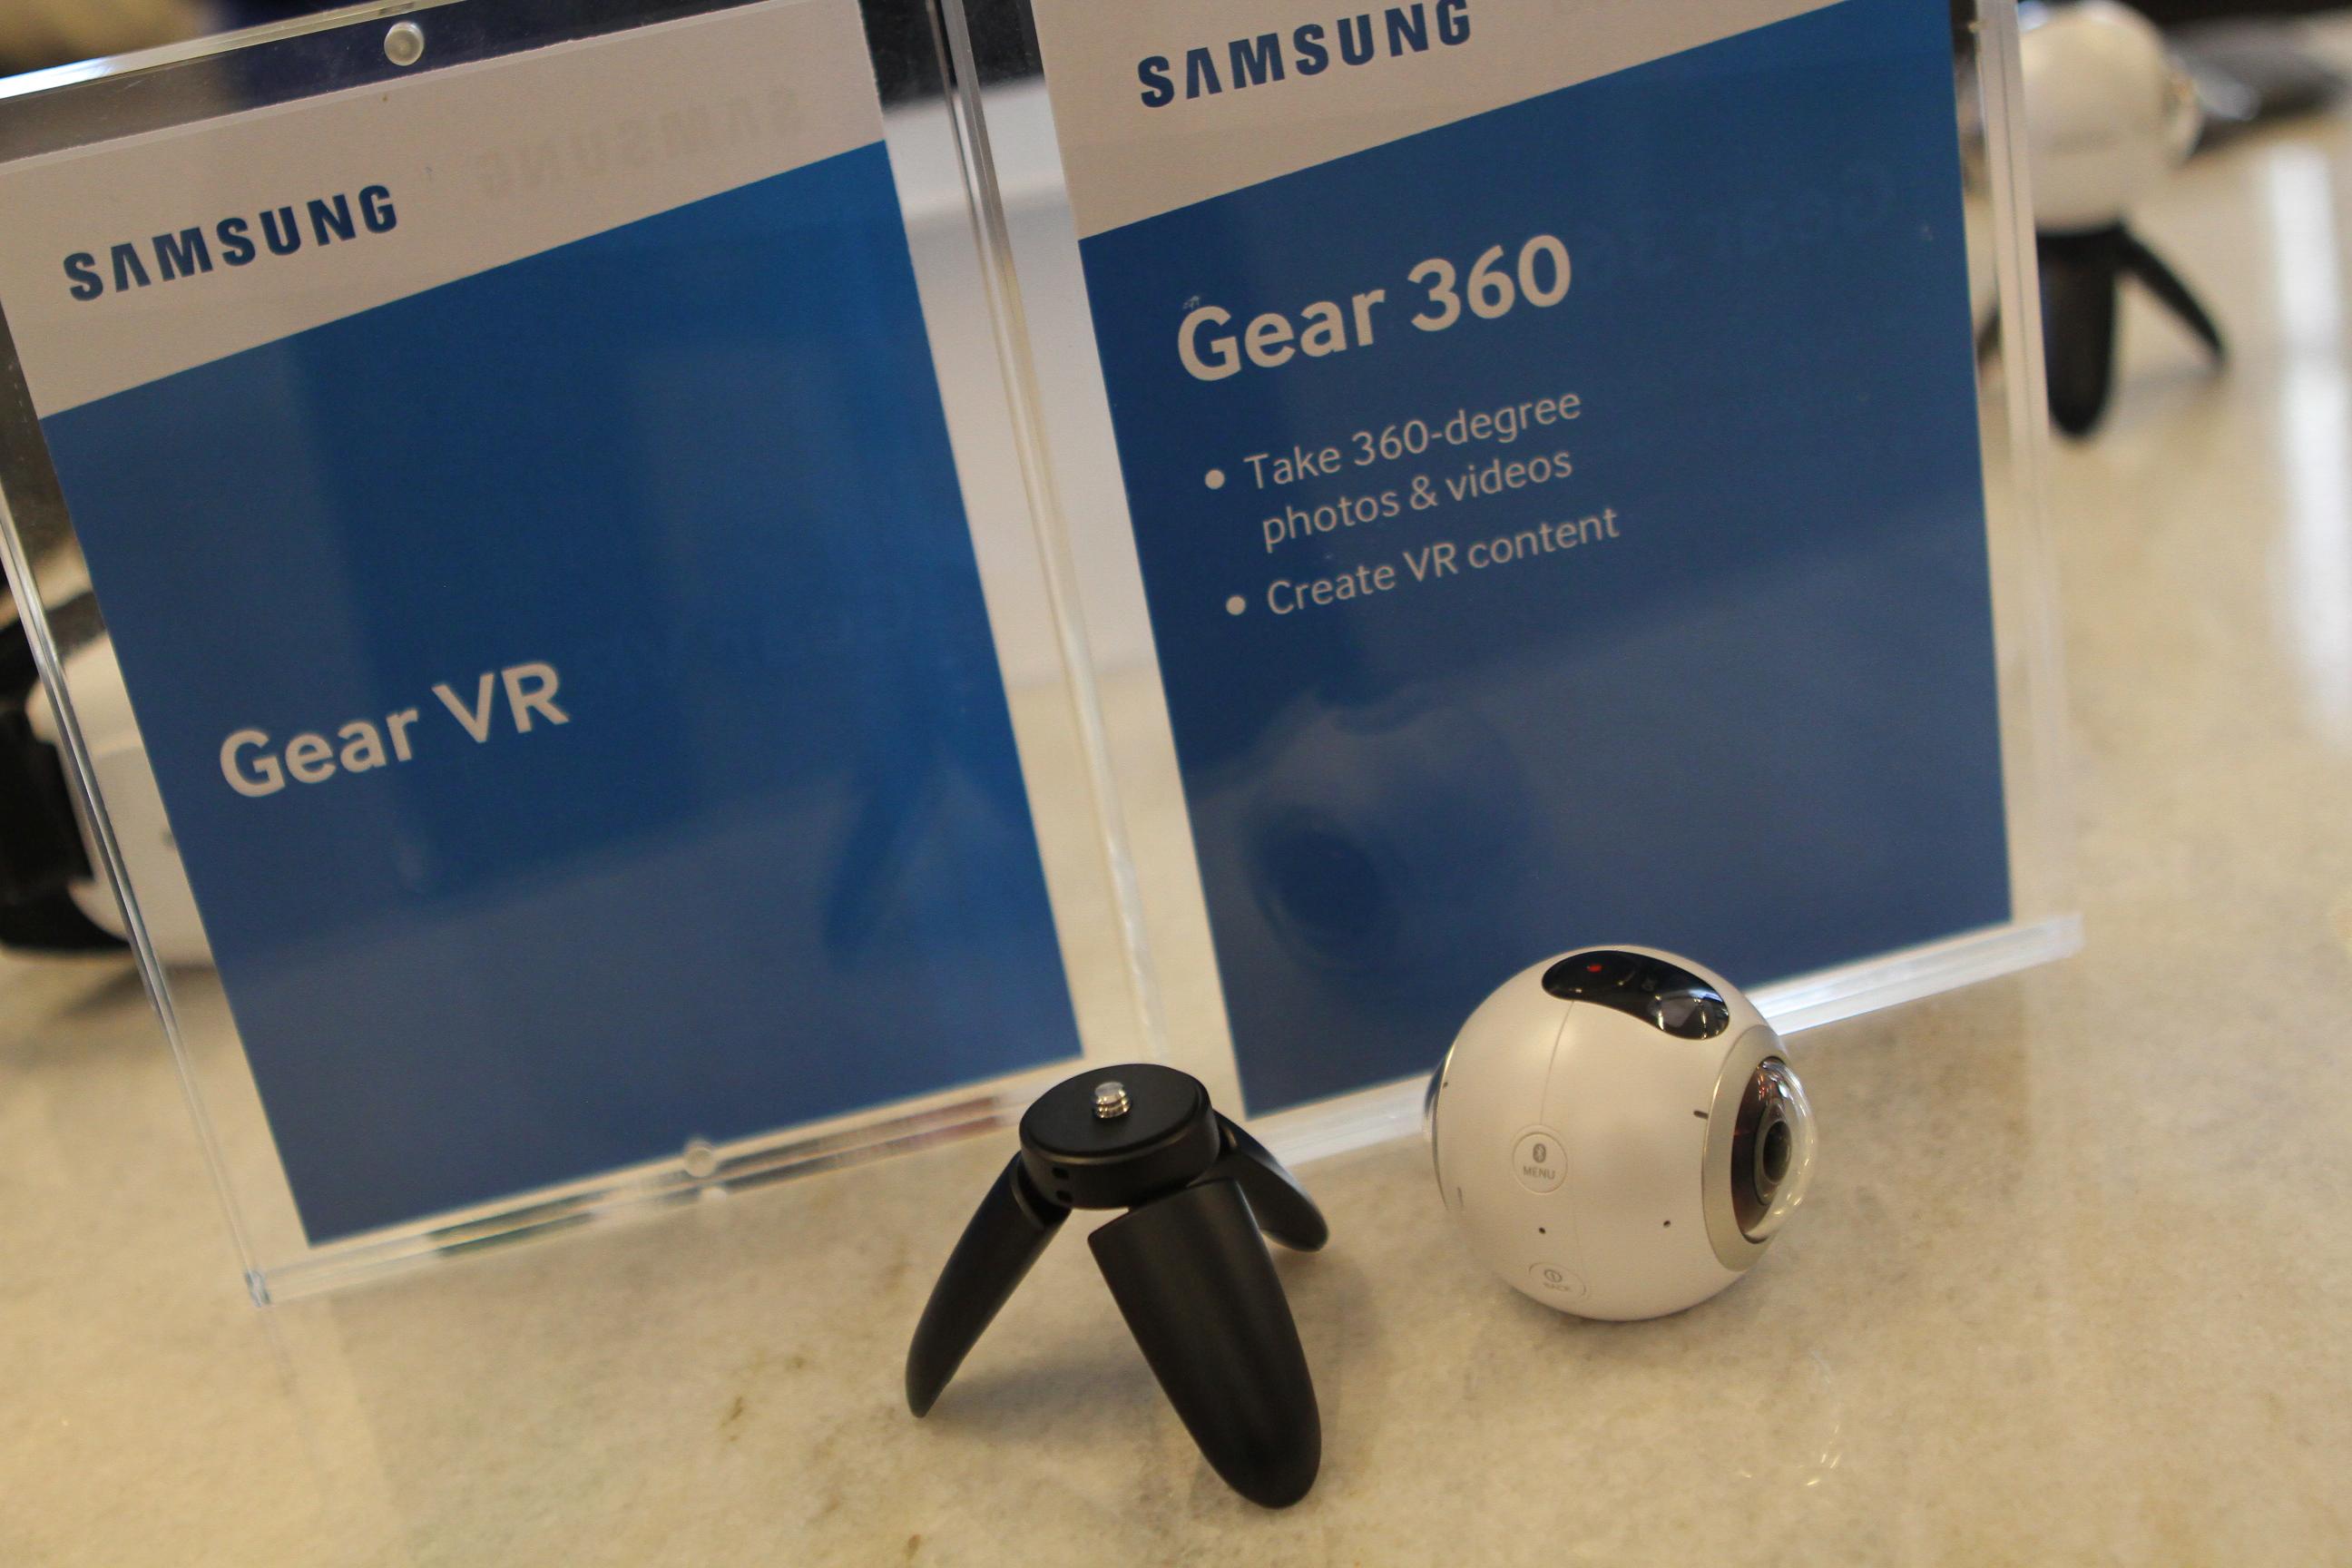 Samsung Gear 360 camera and signage